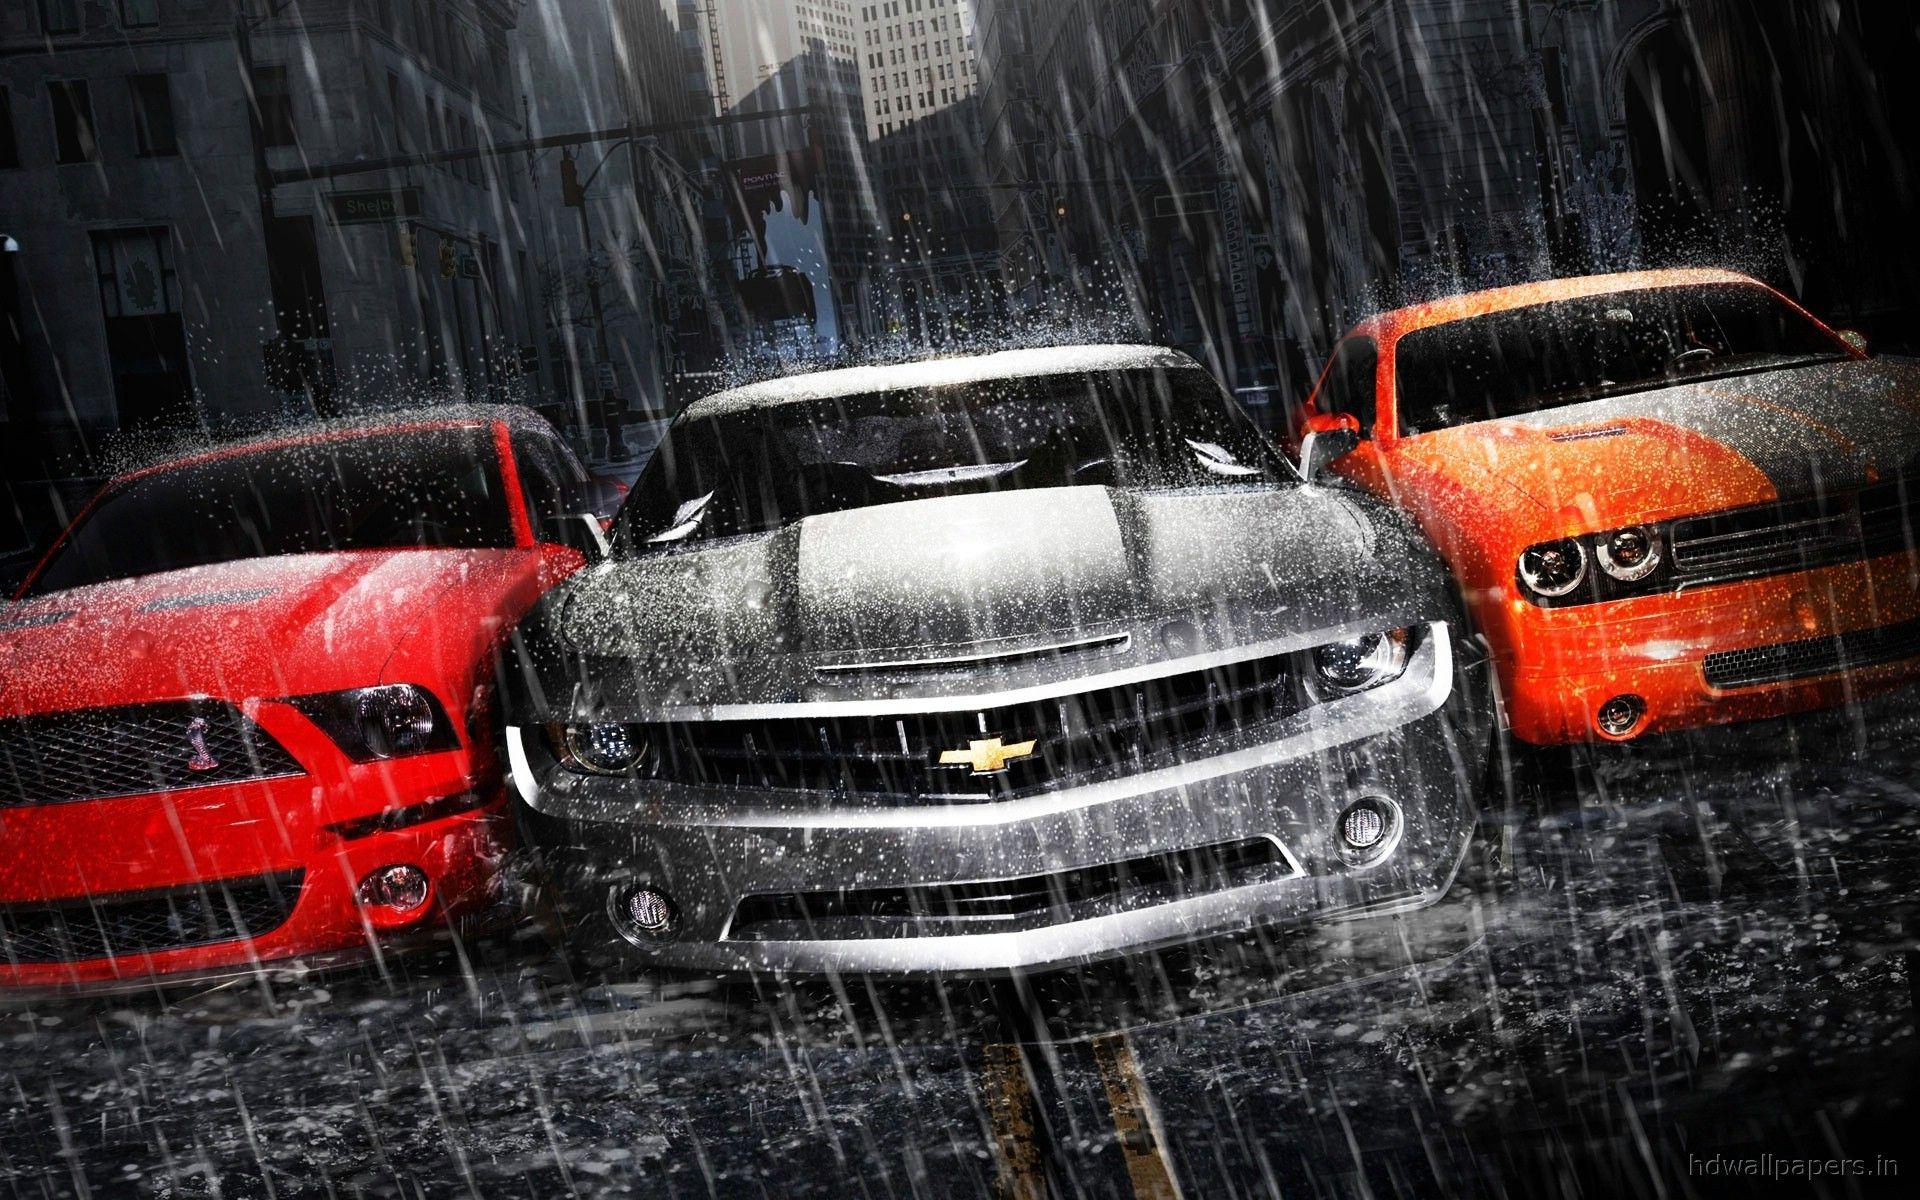 Mustang camaro dodge wallpaper dodge mustangcamarododge http wallautos com